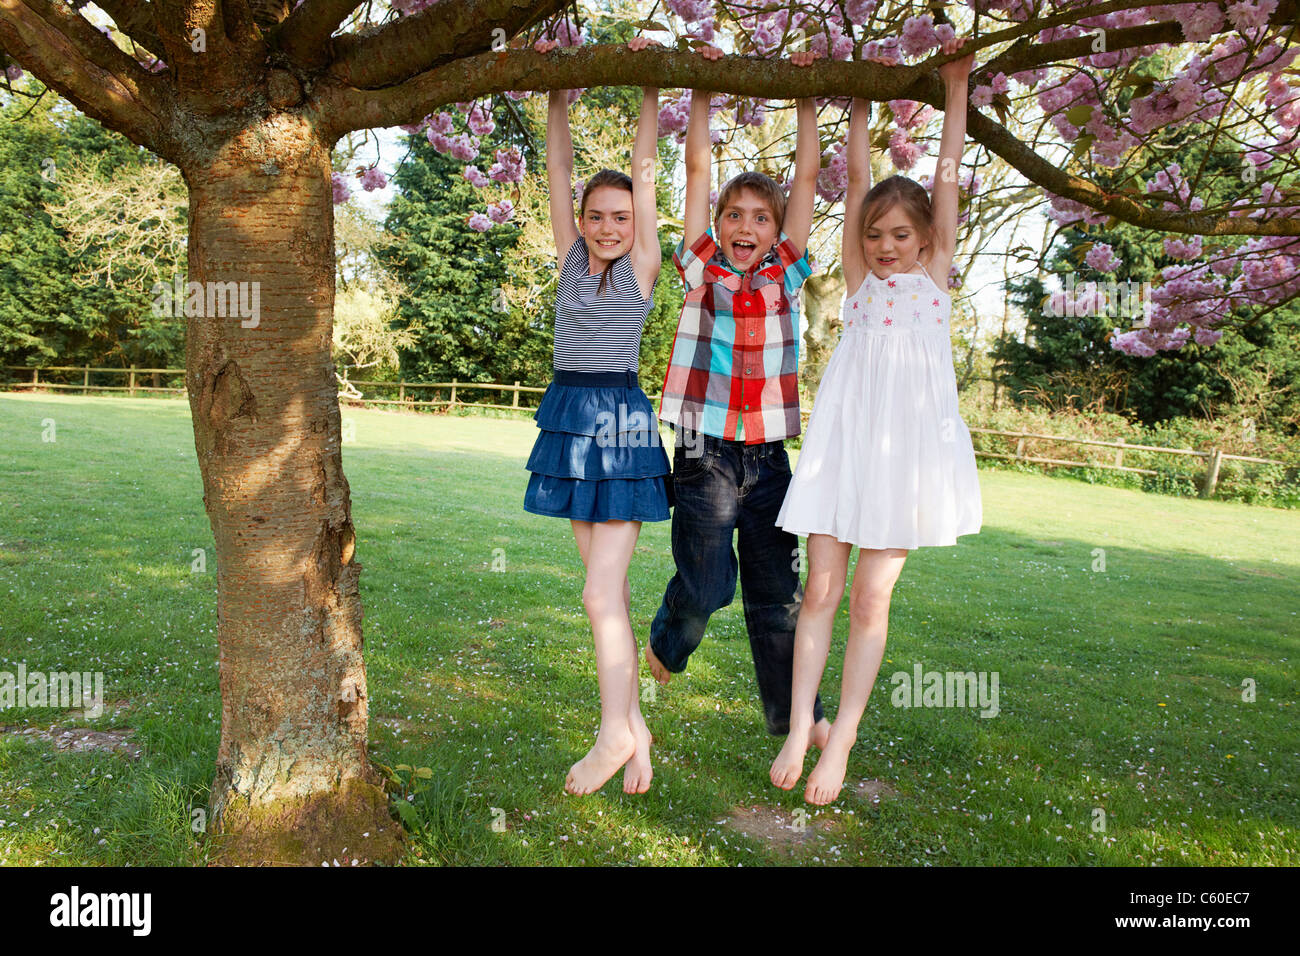 Children swinging from tree in backyard - Stock Image